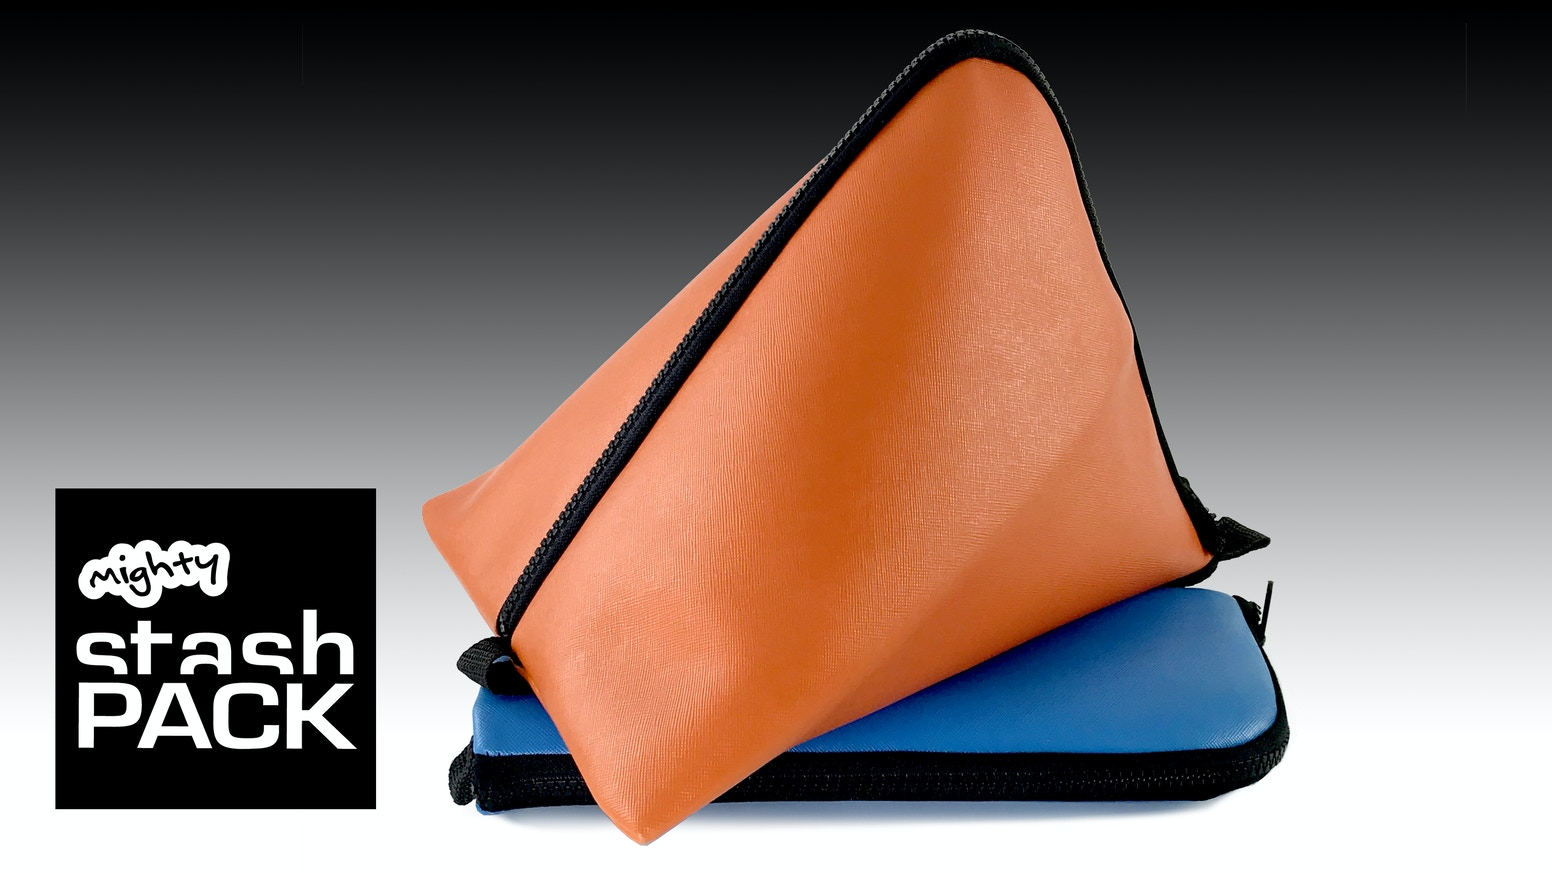 24b8e08052c9 mighty stash pack™ by Dynomighty Design — Kickstarter